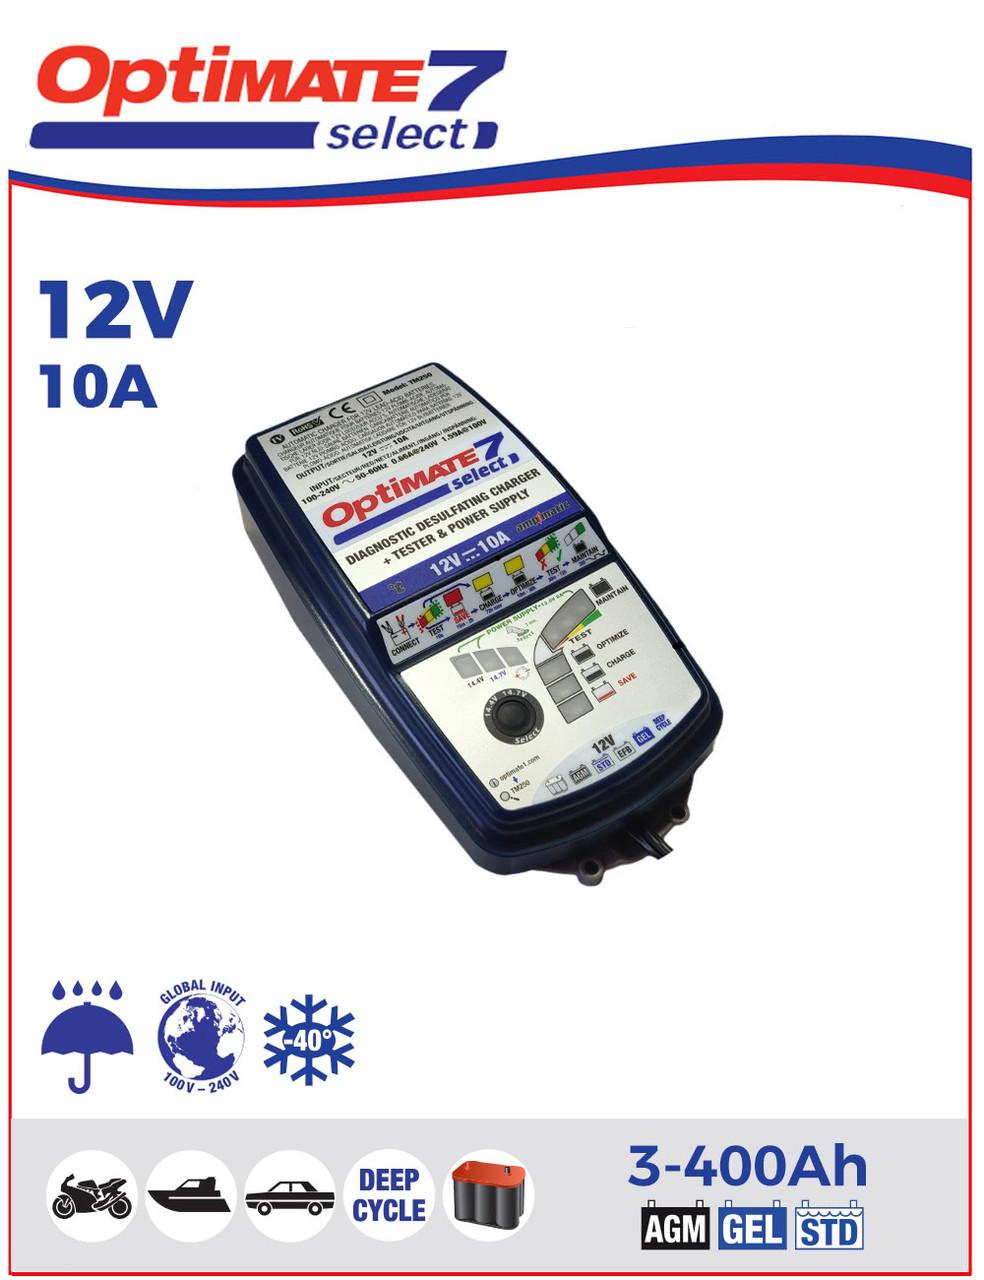 Зарядное устройство ™OptiMate 7 Select TM250 (1x10А, 12V)